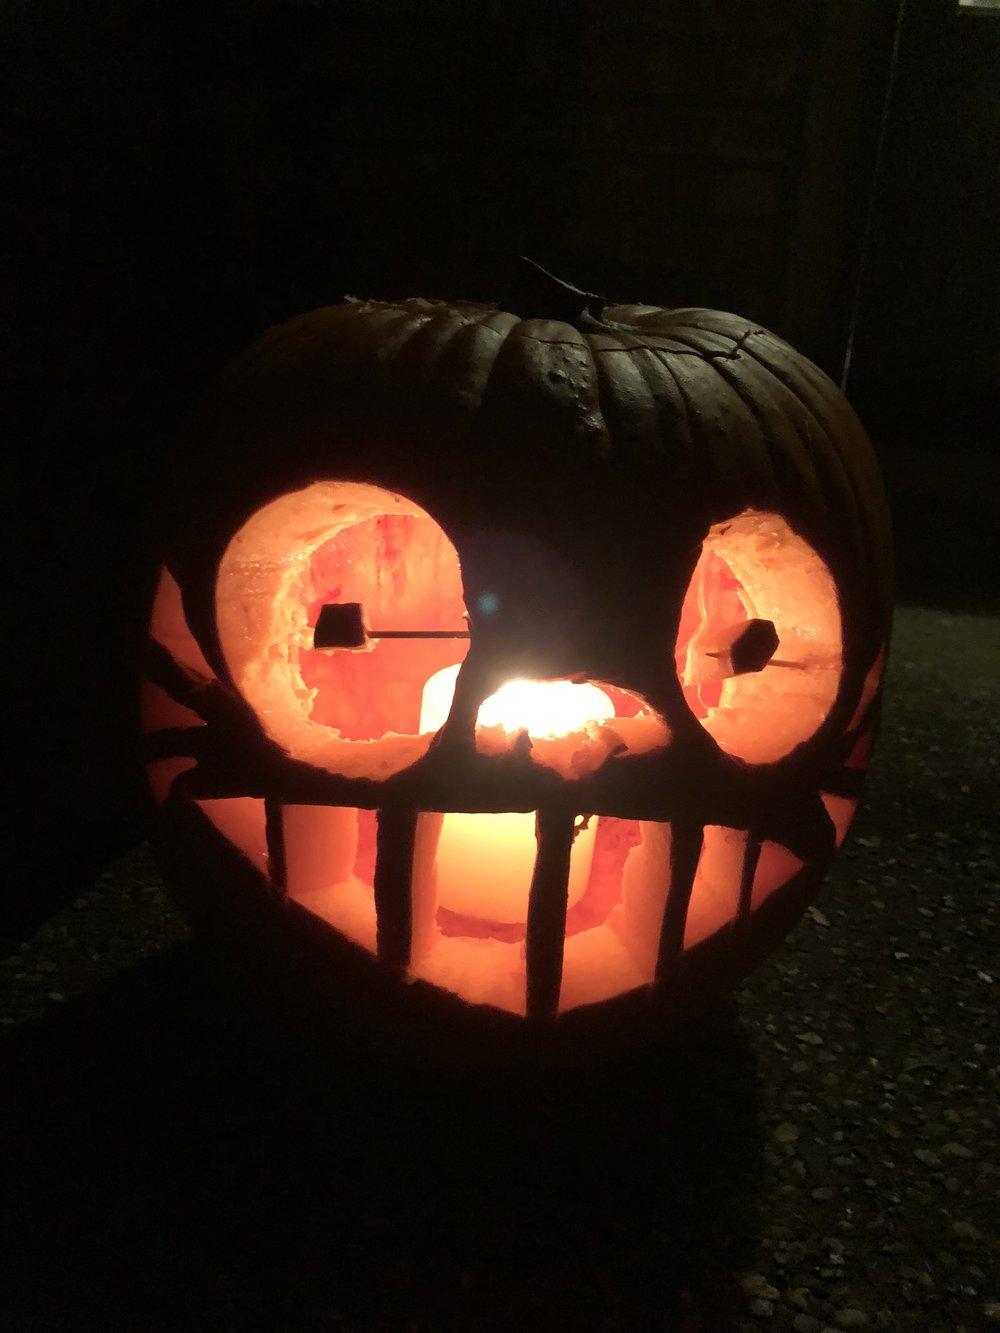 our My Neighbor Totoro pumpkin, lookin' pretty good if I do say so myself...